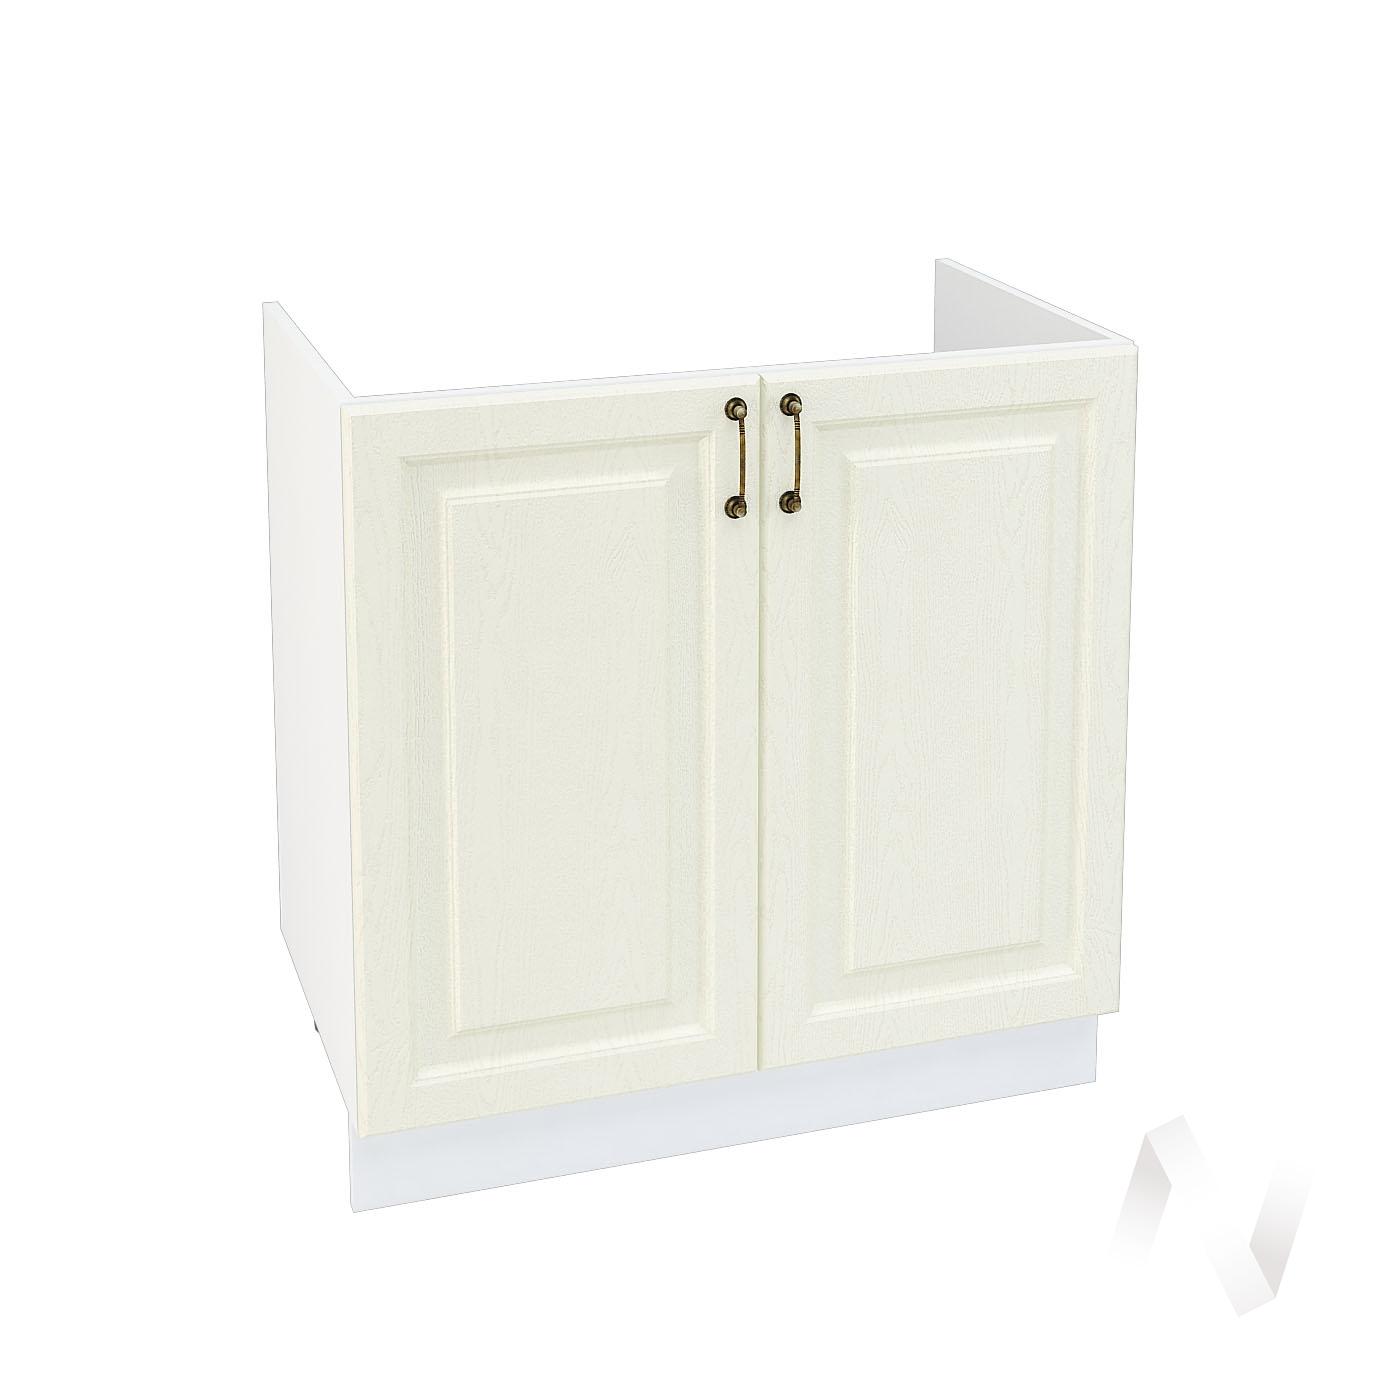 "Кухня ""Ницца"": Шкаф нижний под мойку 800, ШНМ 800 (Крем/корпус белый)"